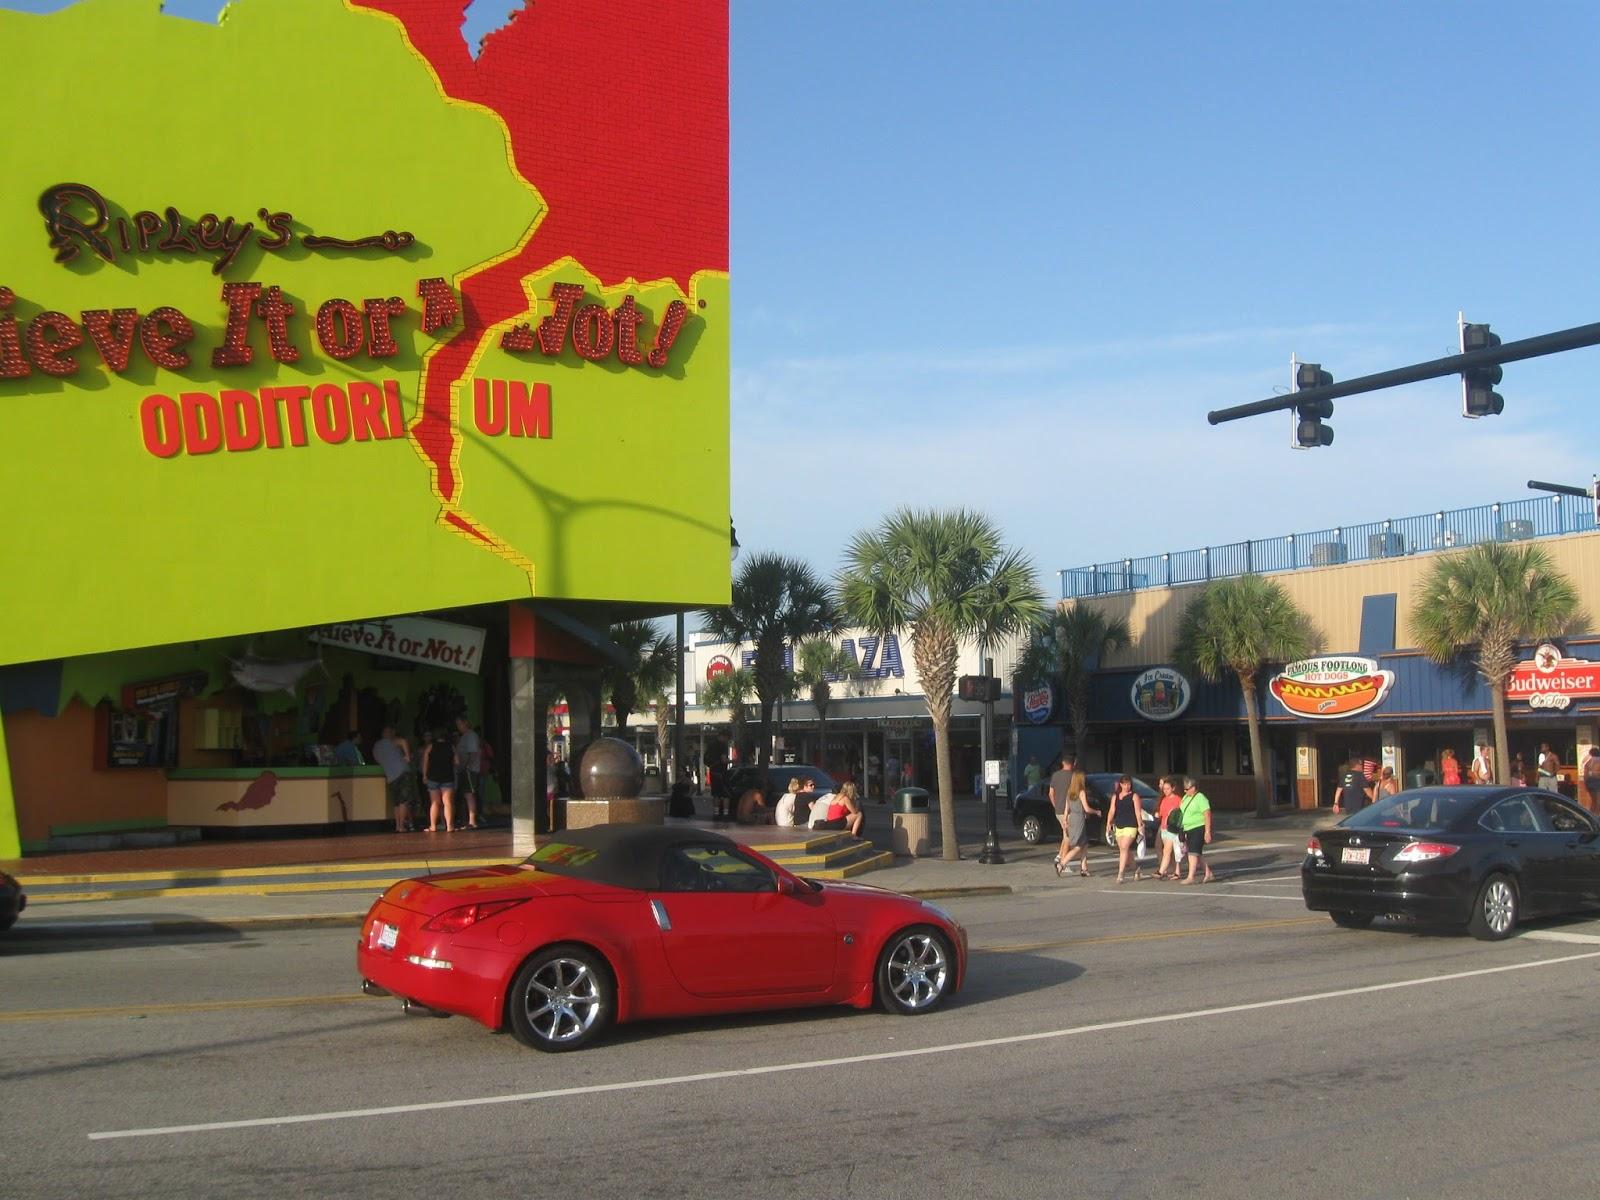 Ripley S Believe It Or Not Myrtle Beach South Carolina The Best